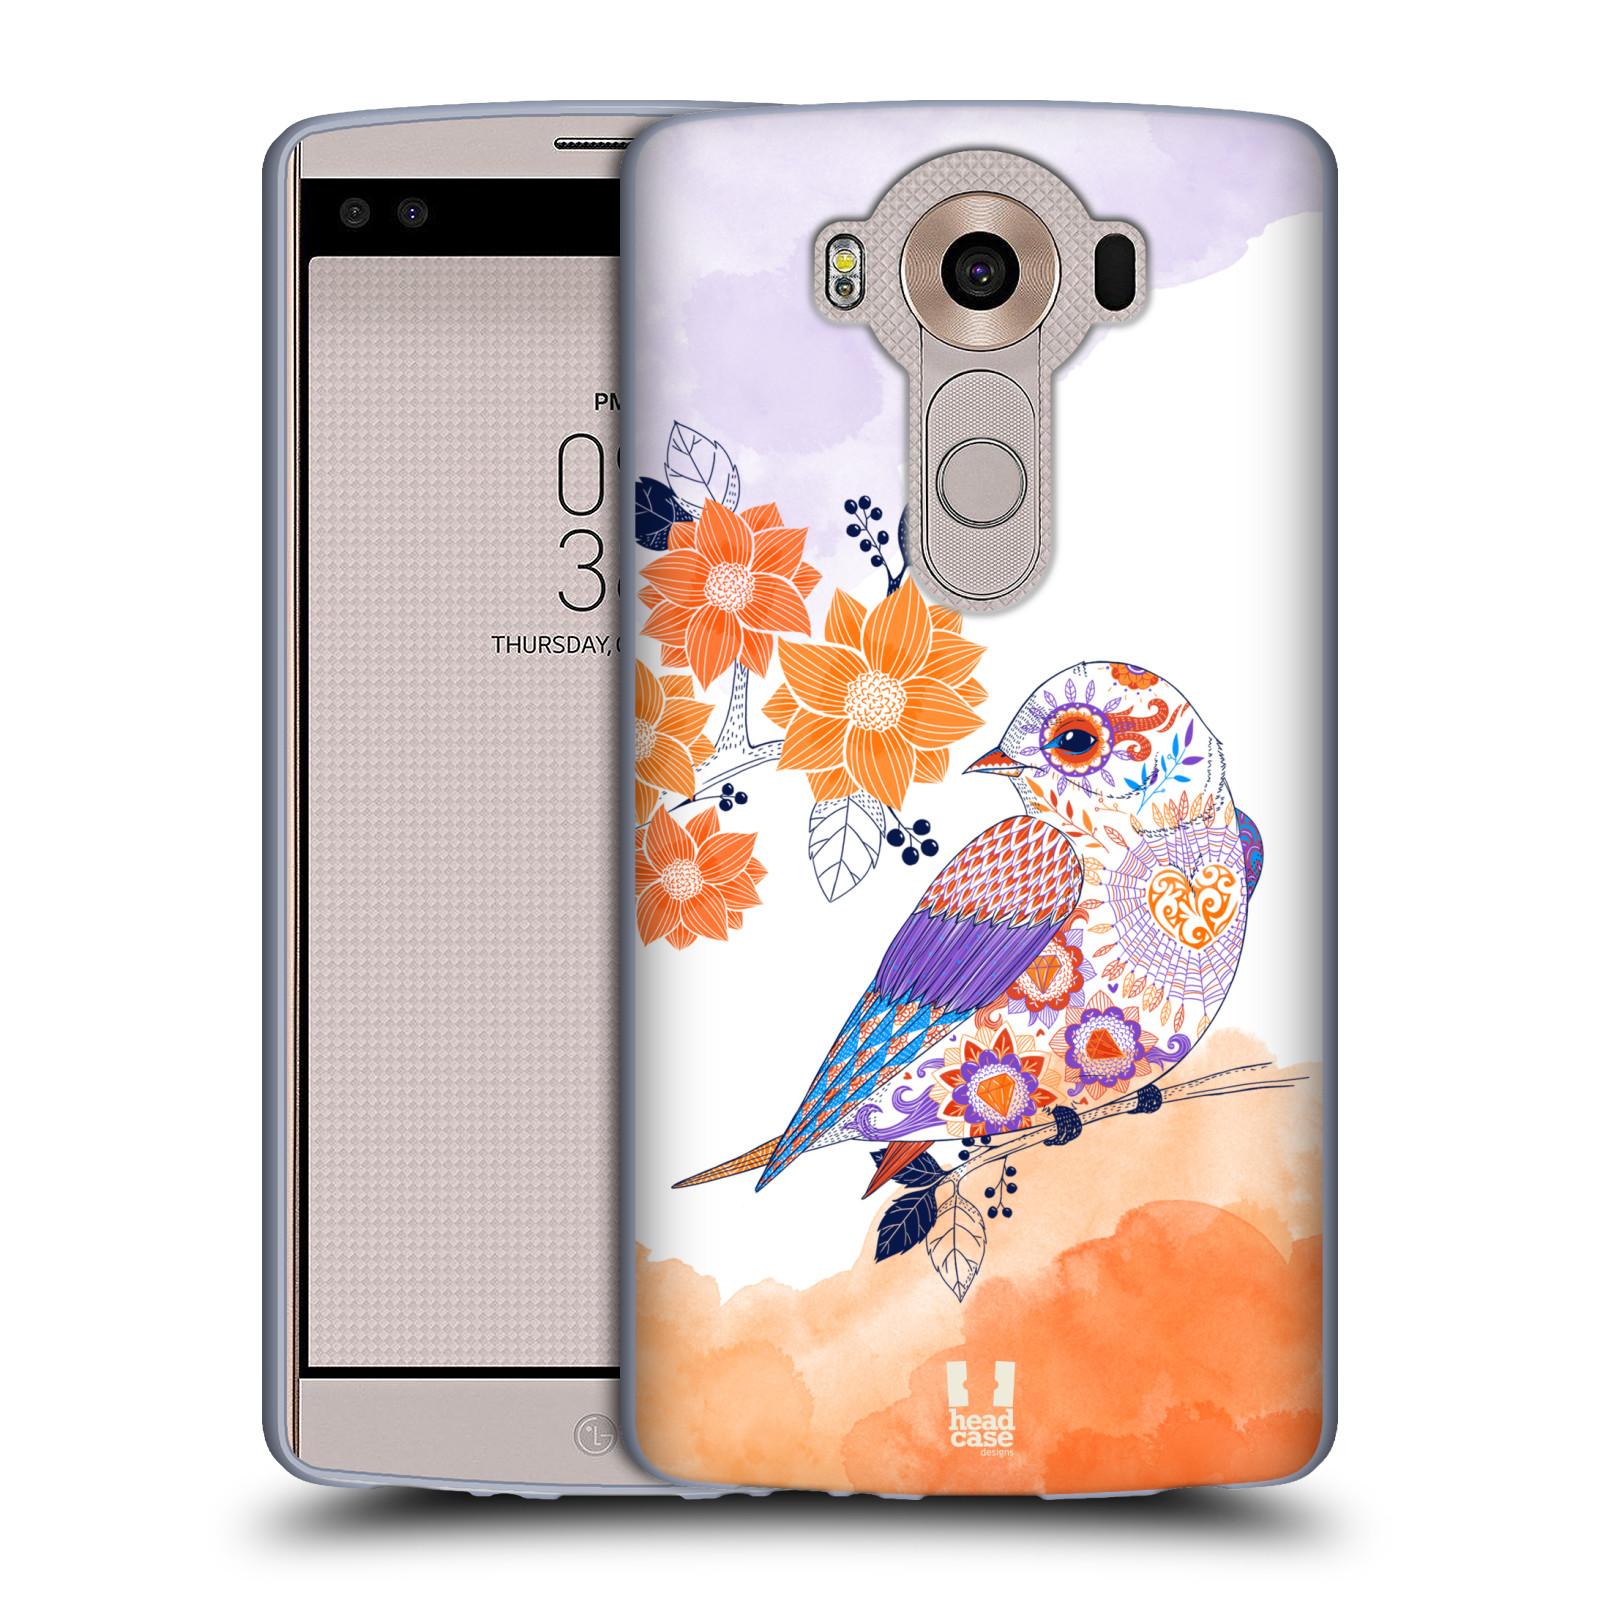 HEAD CASE silikonový obal na mobil LG V10 (H960A) vzor Květina ptáčci ORANŽOVÁ